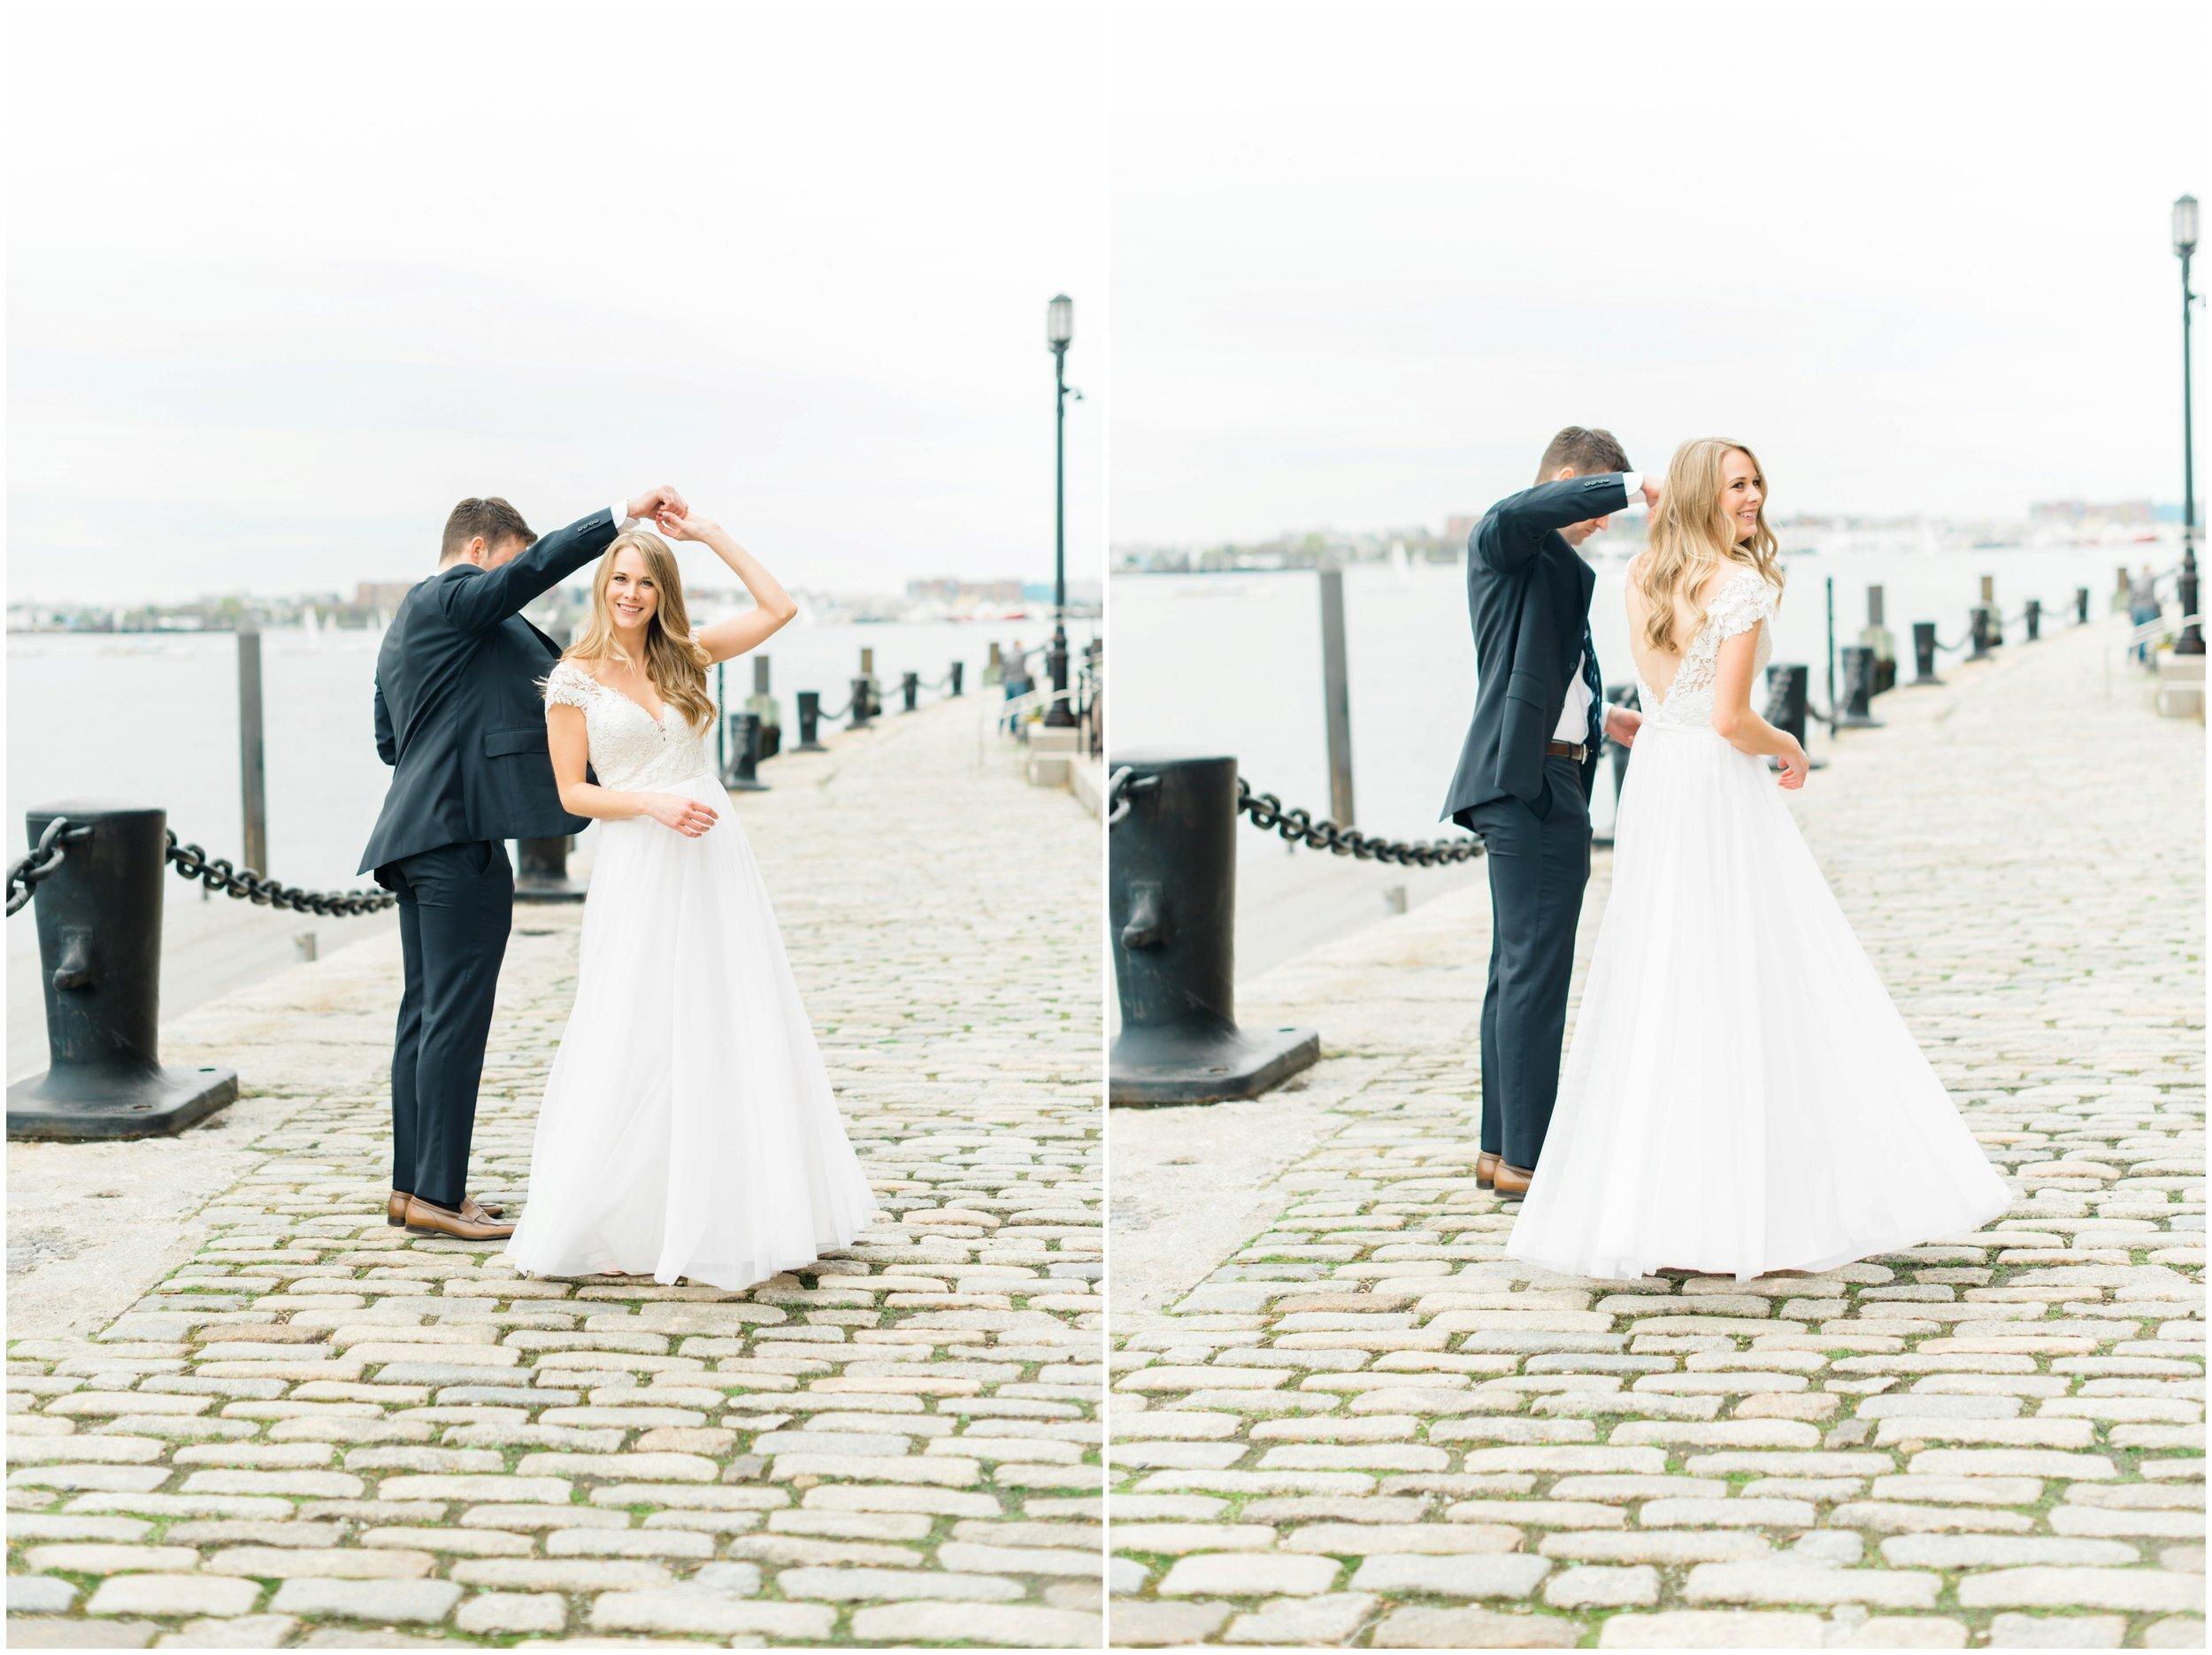 jay-robin-married-row-34-boston-20.jpg